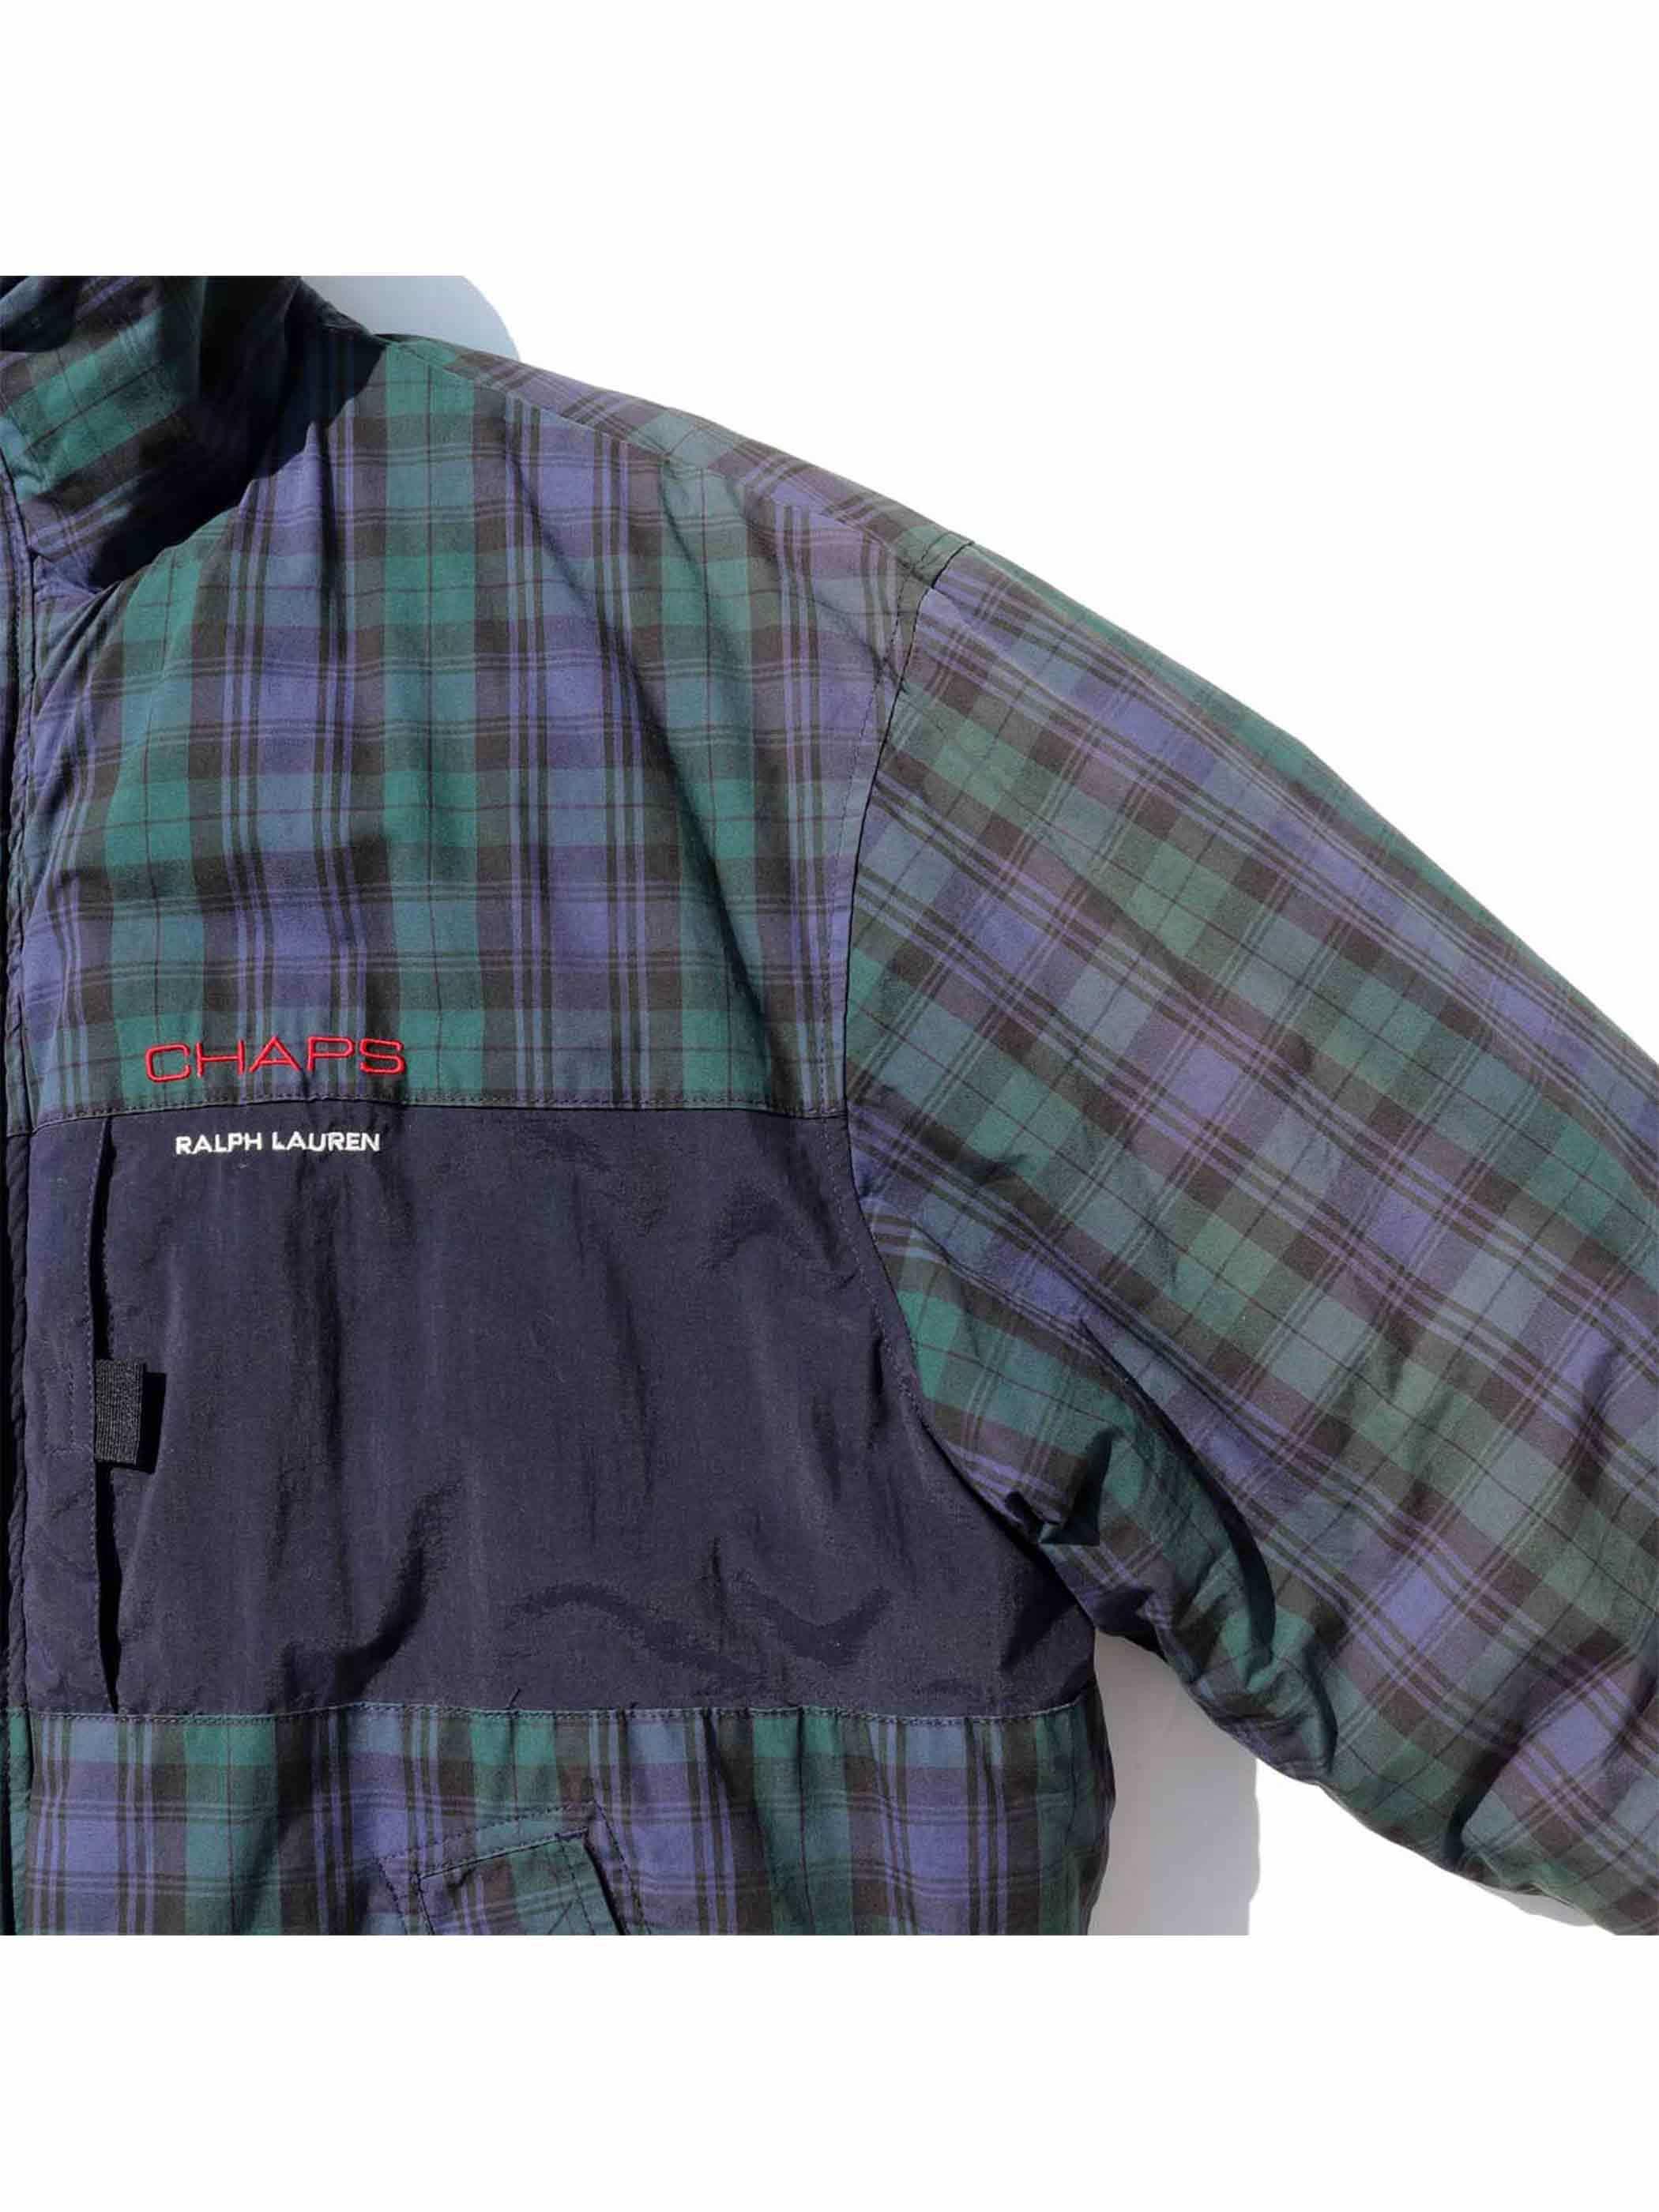 90's CHAPS RALPH LAUREN ブラックウォッチ パディングジャケット [M]